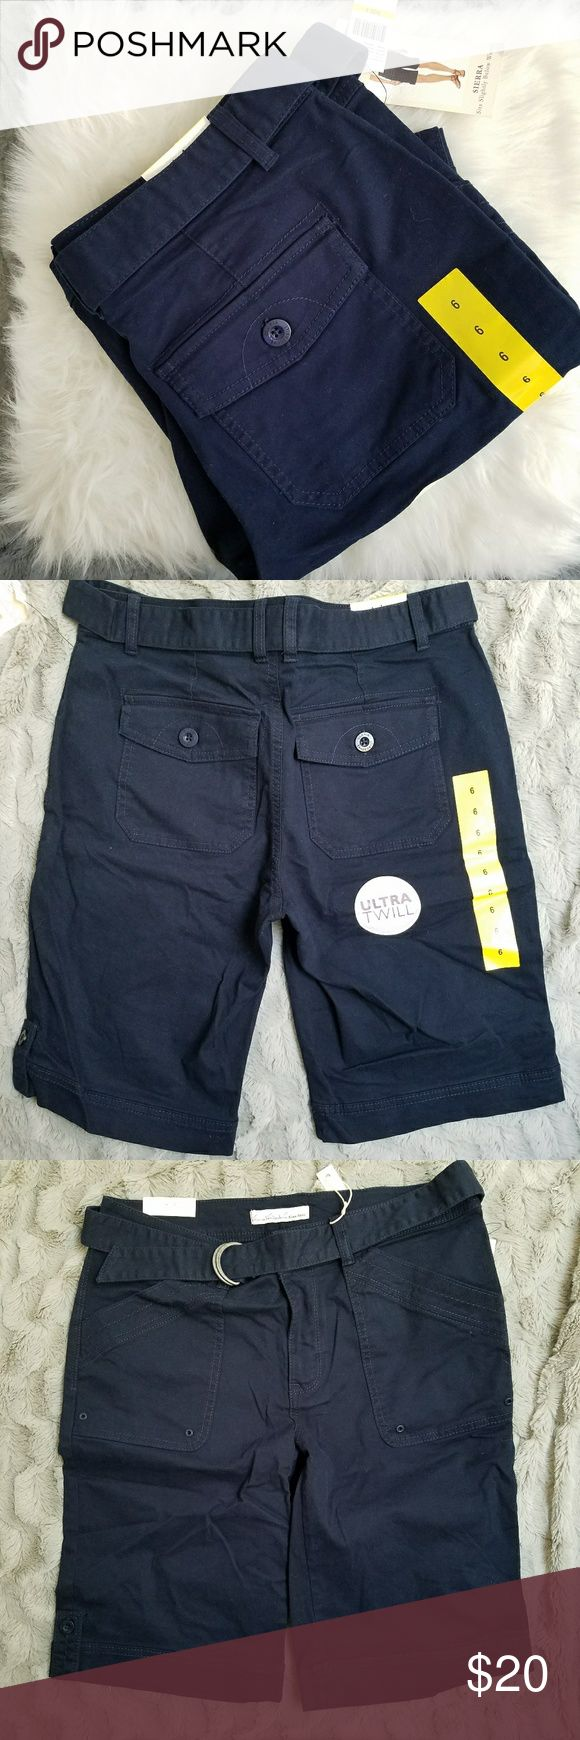 Gloria Vanderbilt Khaki Unltd Sierra Shorts Brand new with tags shorts by Gloria Vanderbilt Khaki unltd. Size 6 and sits slightly below the waist. Comes with a belt. Waist is 16 inches, rise is 9.5 inches and inseam is 11 inches. (A85) Gloria Vanderbilt Shorts